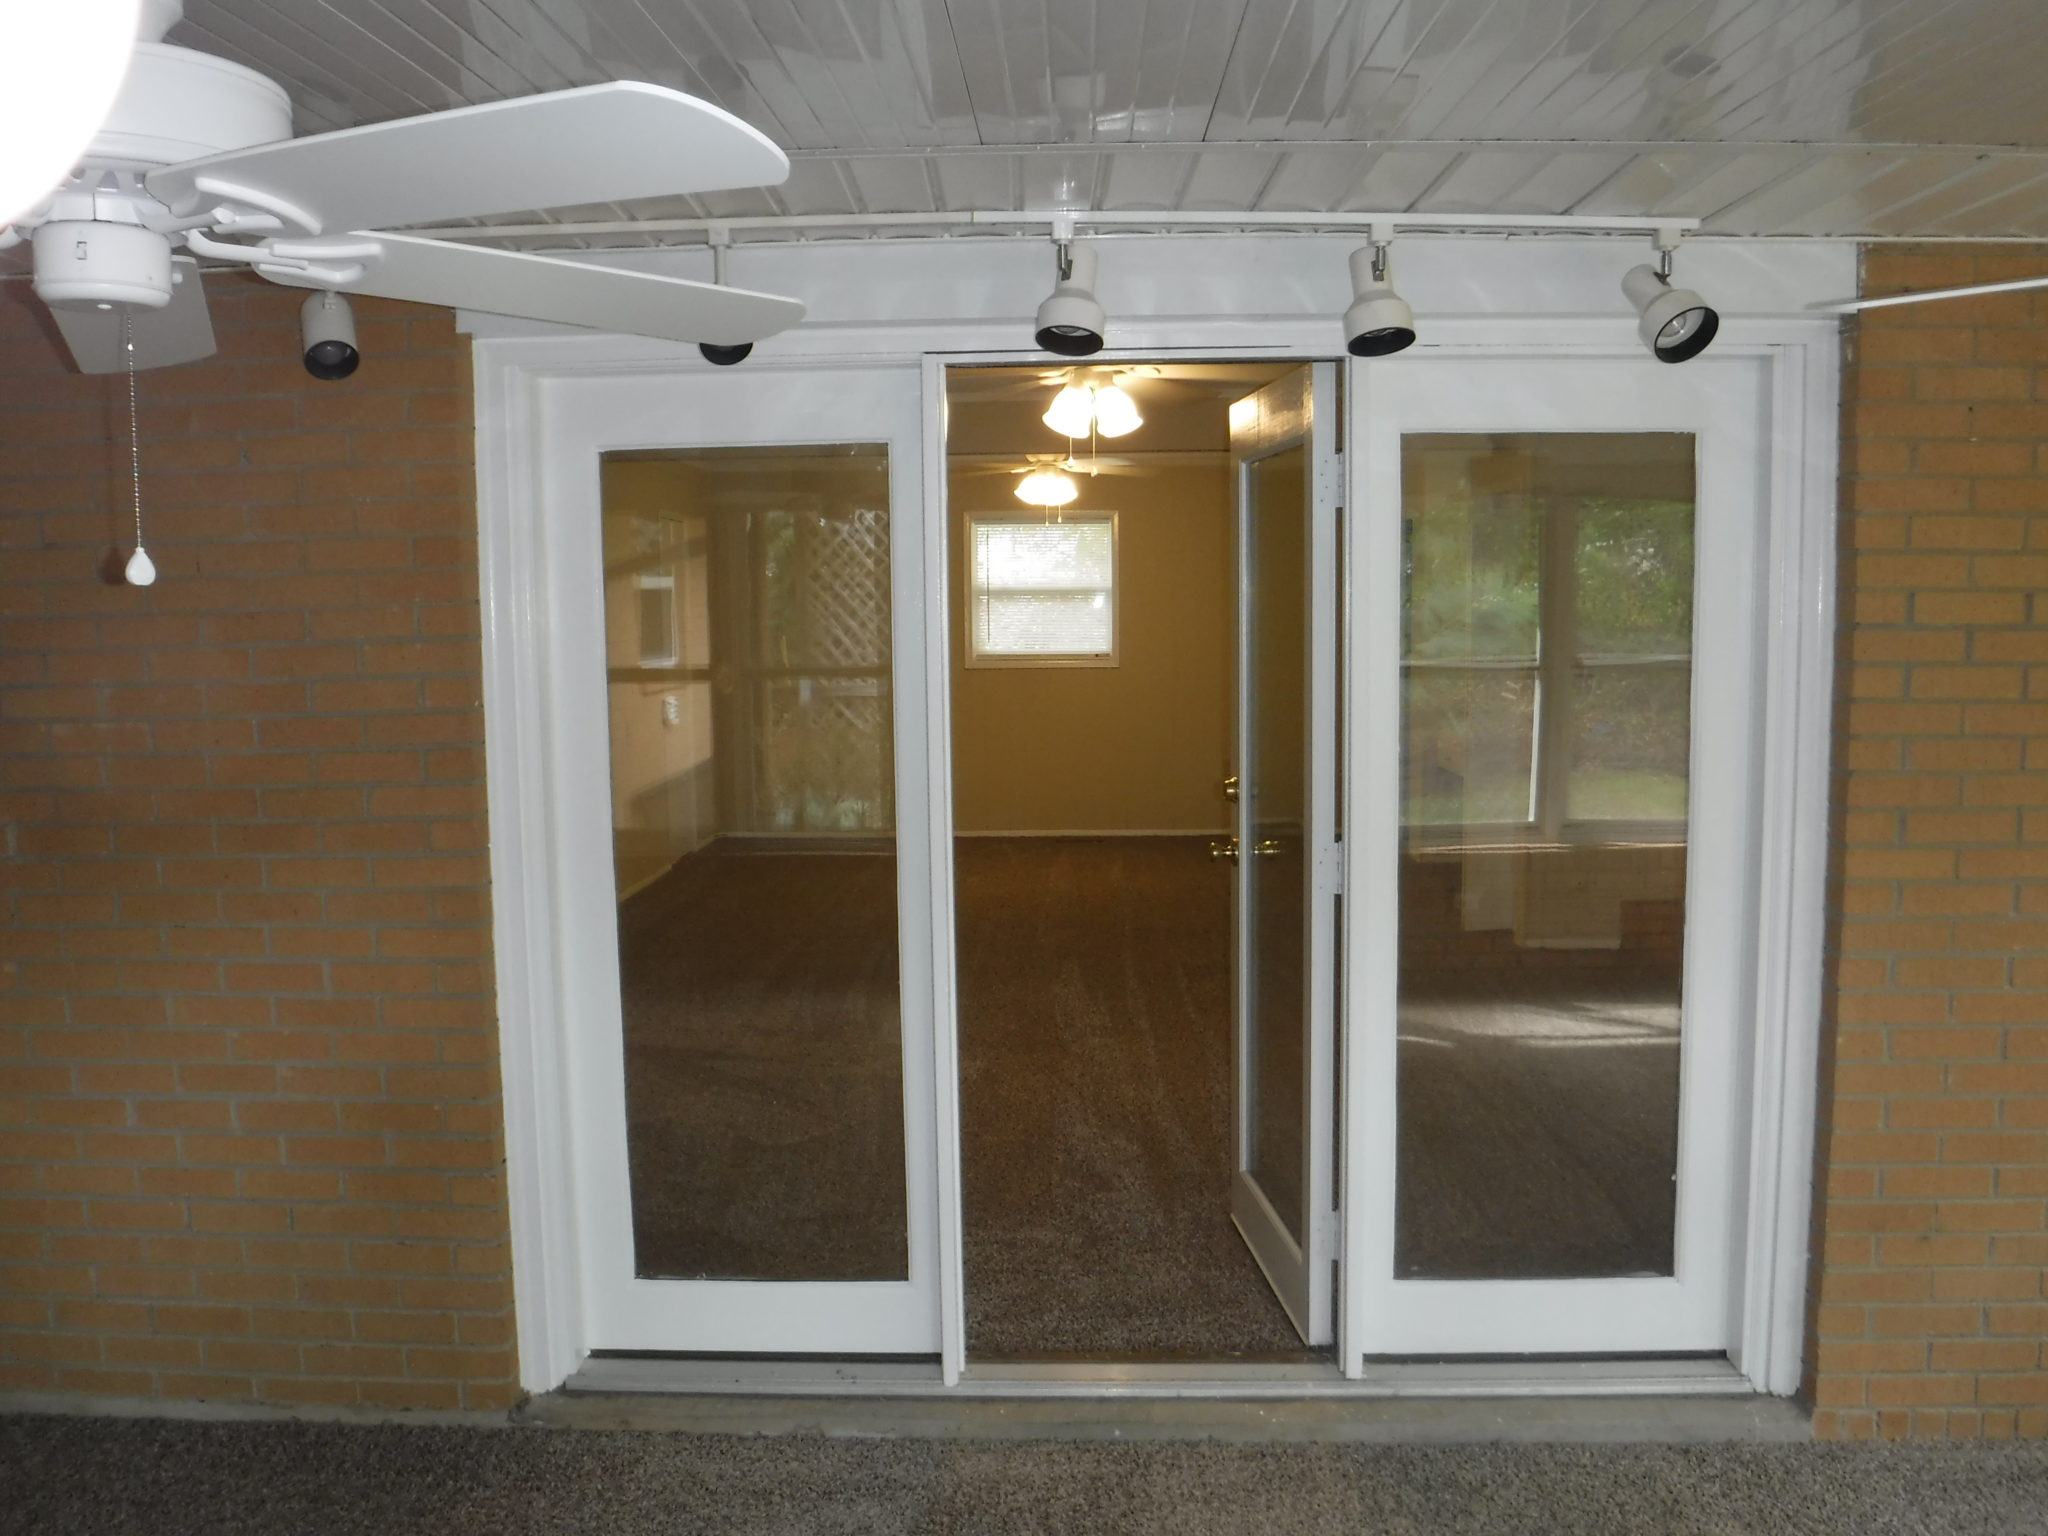 12 X 18 Sunroom With Door To 18 X 24 Family Room Veteran S Realty